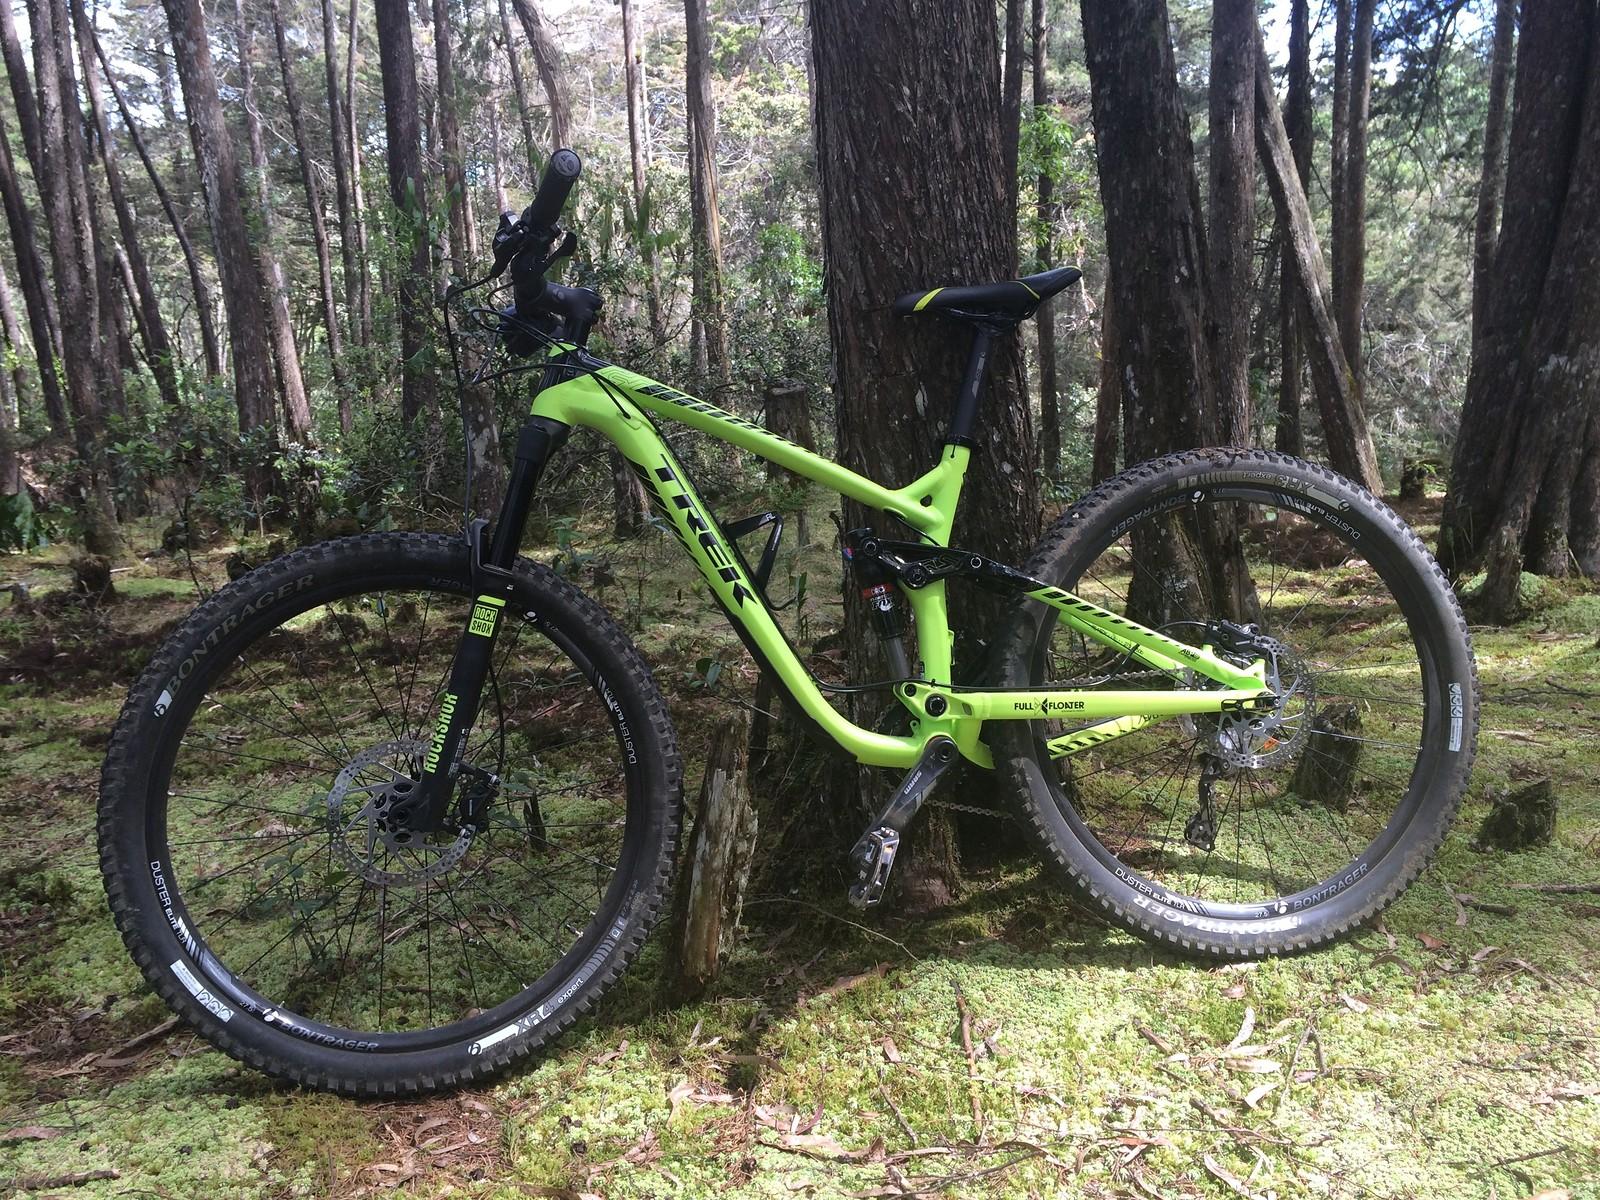 aa4e8931a74 Trek's Evo rear suspension .....in the woods...... ...